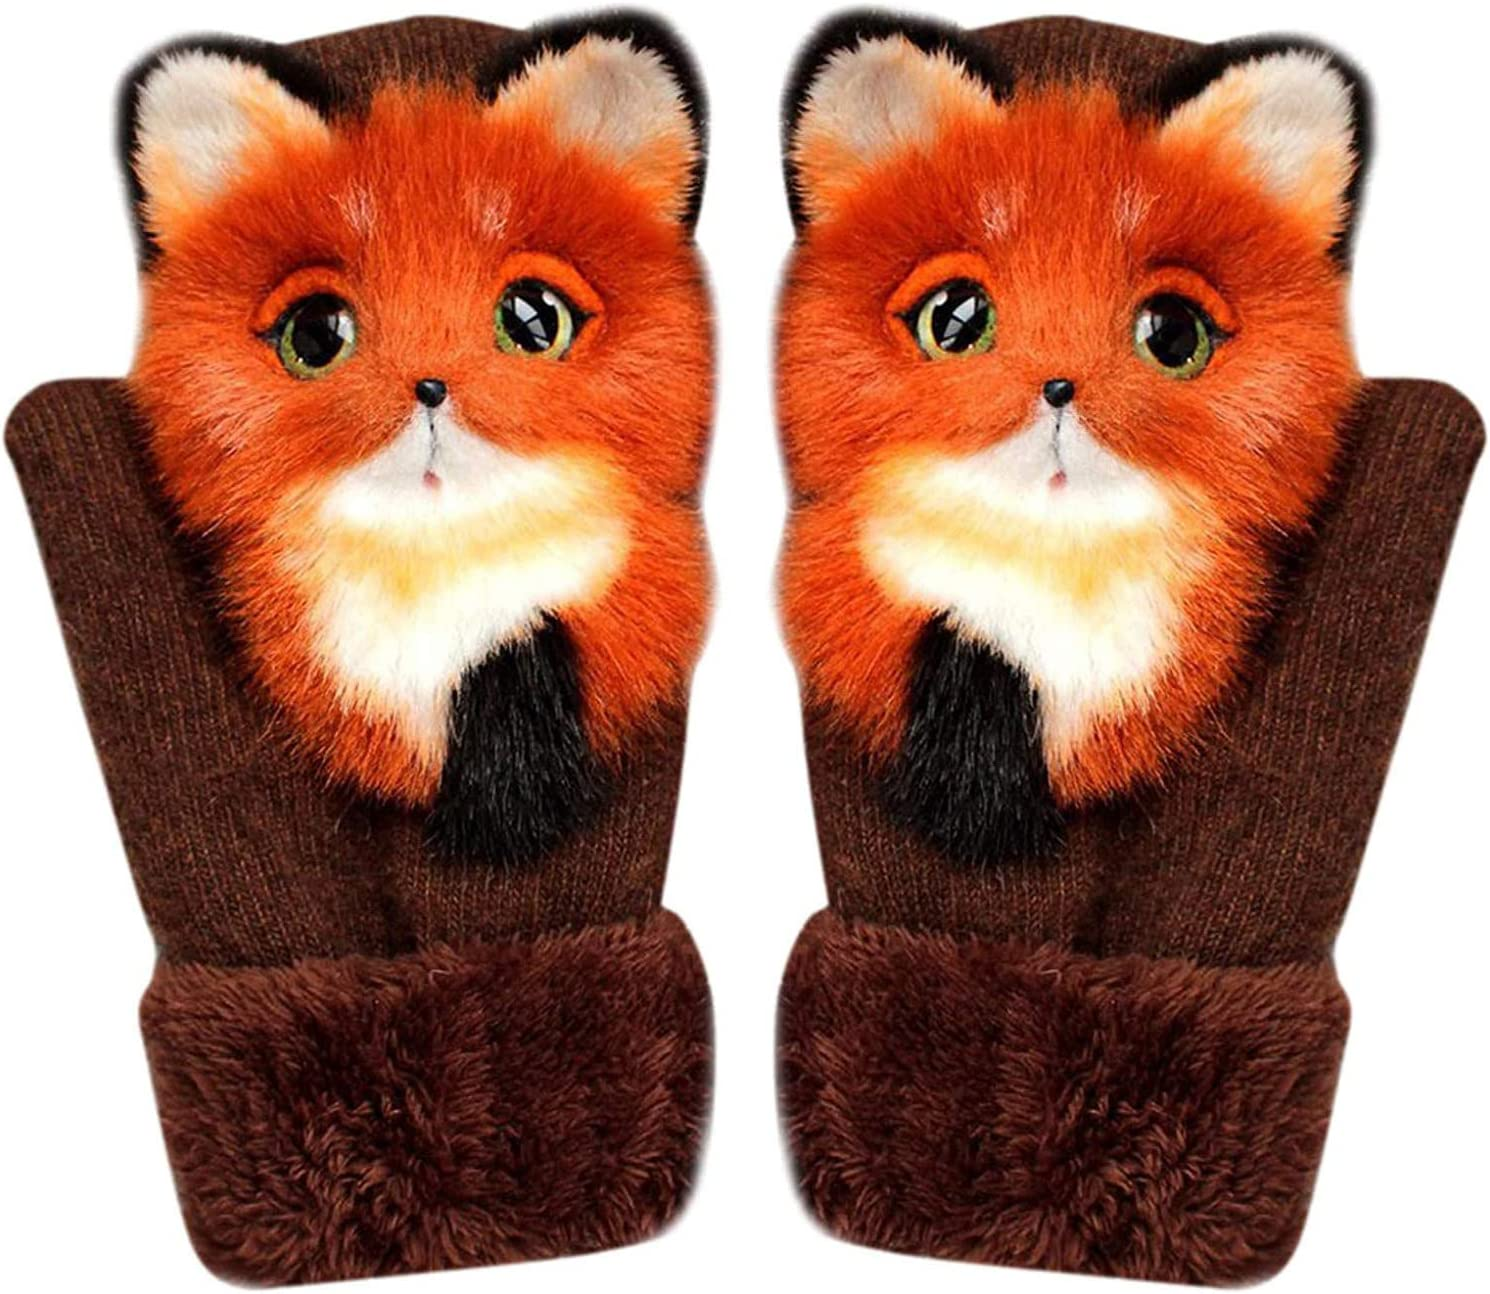 WElinks Fashion Winter Warm Women Gloves Plus Velvet Thickened Cute Cat Cartoon Outfit Mittens Girls Gloves (I)